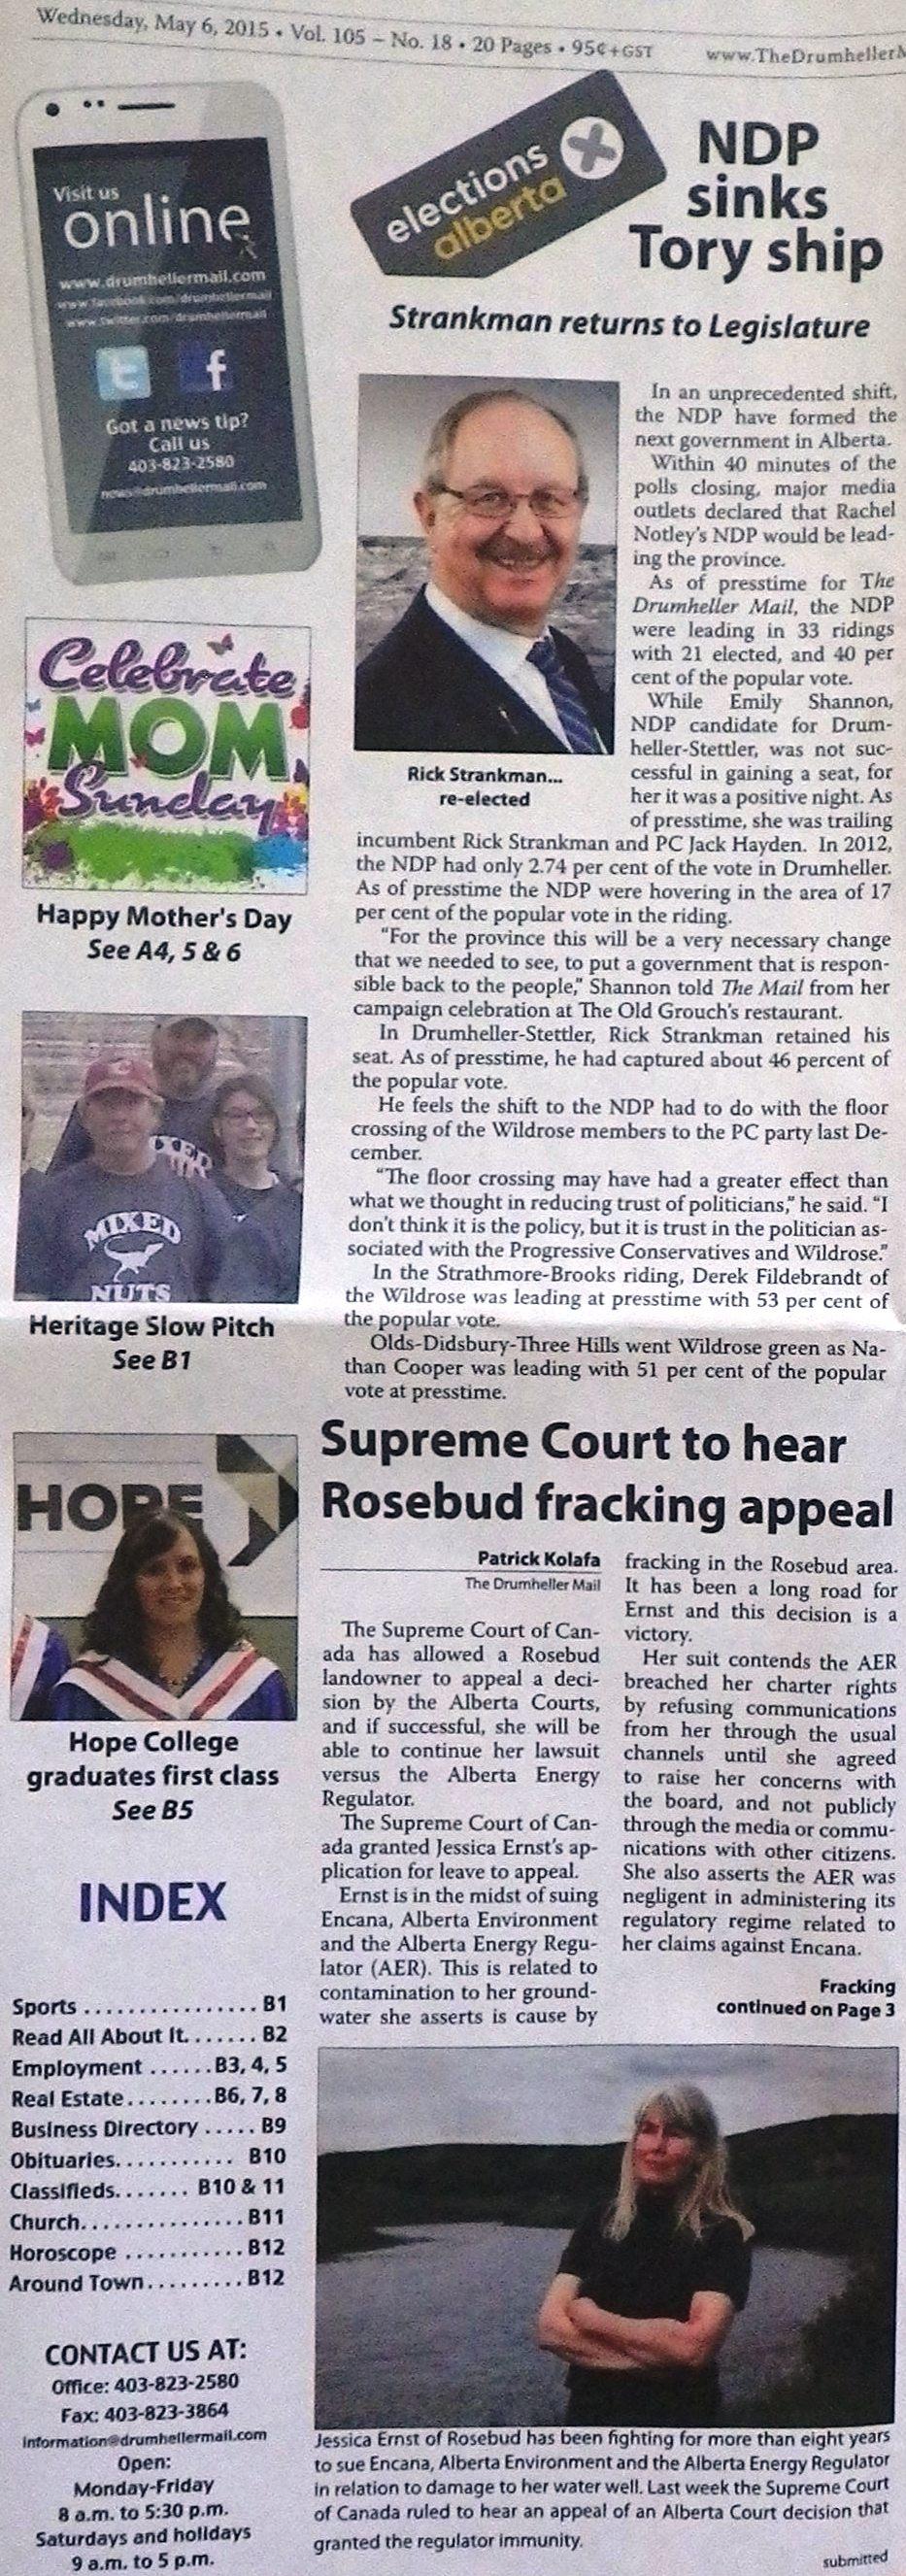 2015 05 06 Drumheller Mail Front Page, Supreme Court to hear Rosebud Fracking appeal